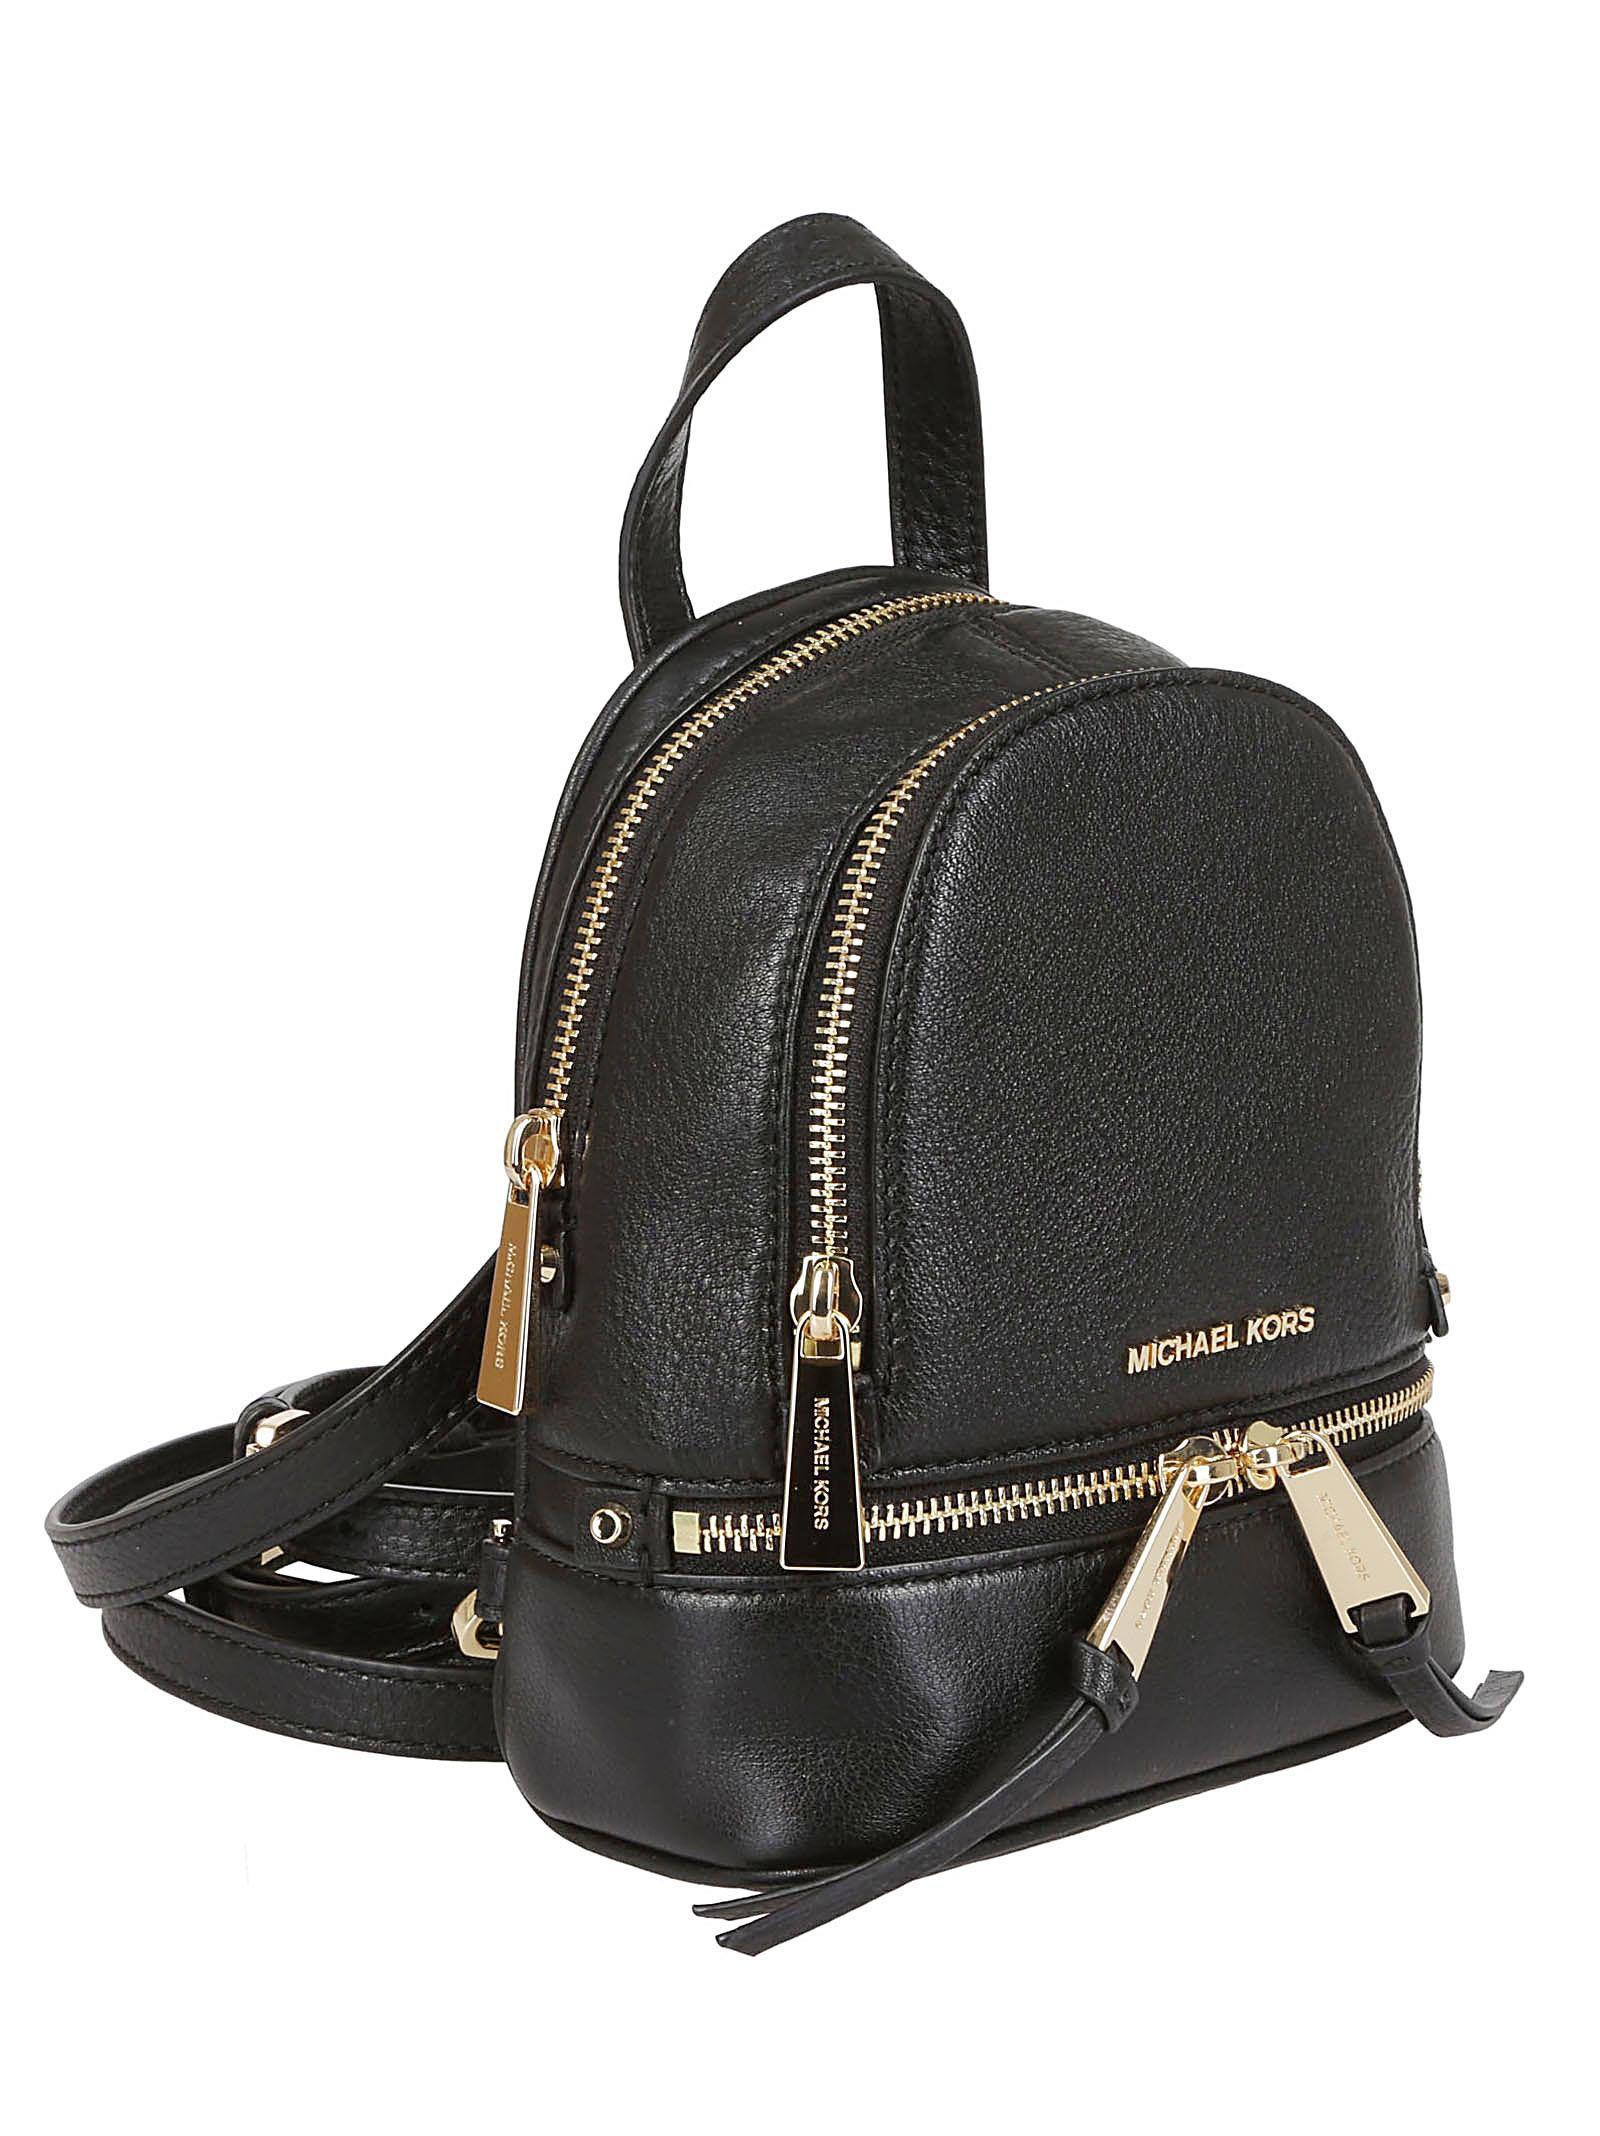 da61e5f56bf9 Michael Kors Michael Kors Rhea Mini Backpack - Nero/oro - 10815979 ...